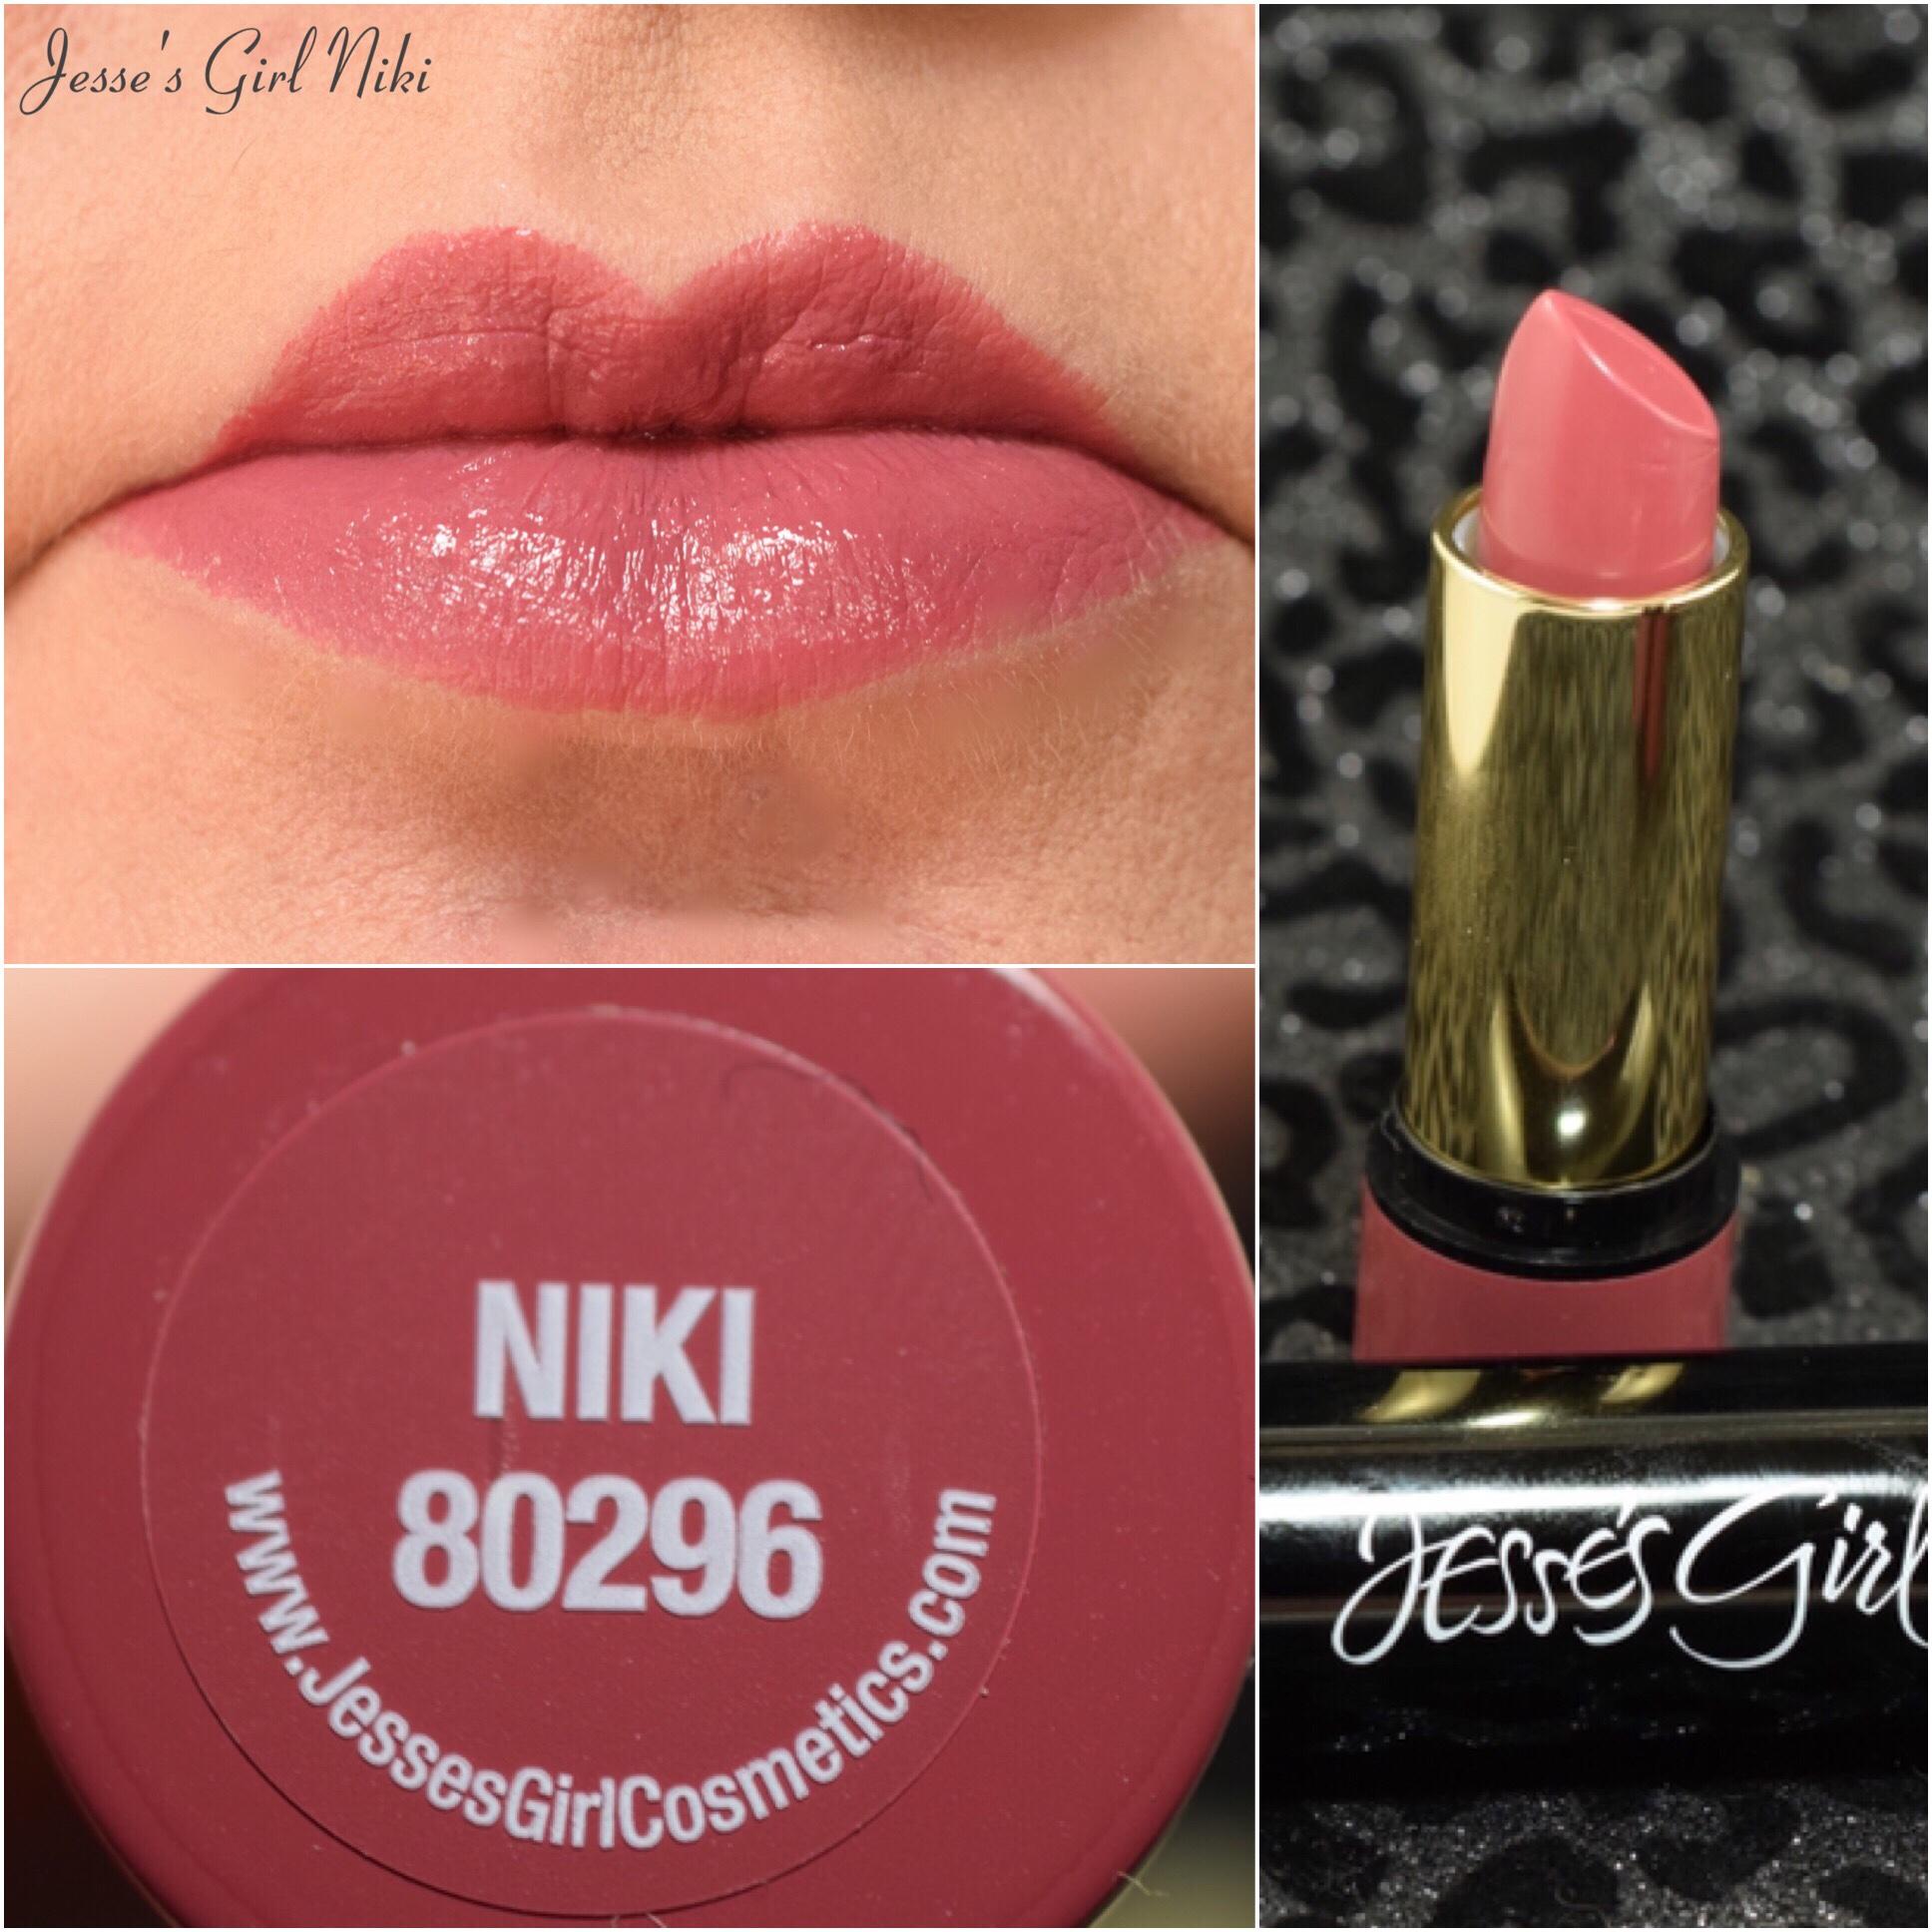 Jesse's Girl Niki